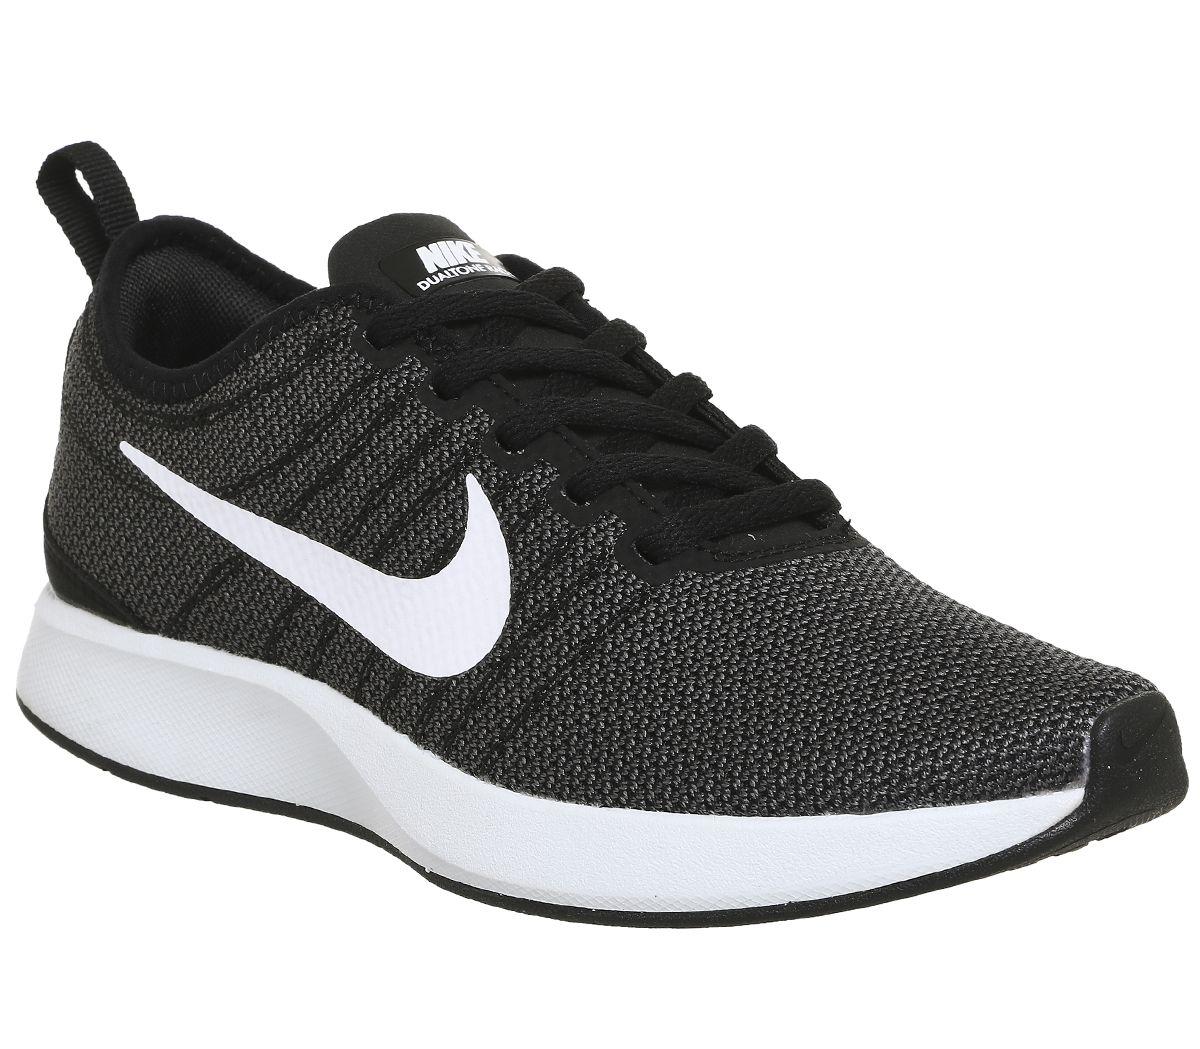 online store e57bd 33f03 Nike Dualtone Racer Black White - Hers trainers